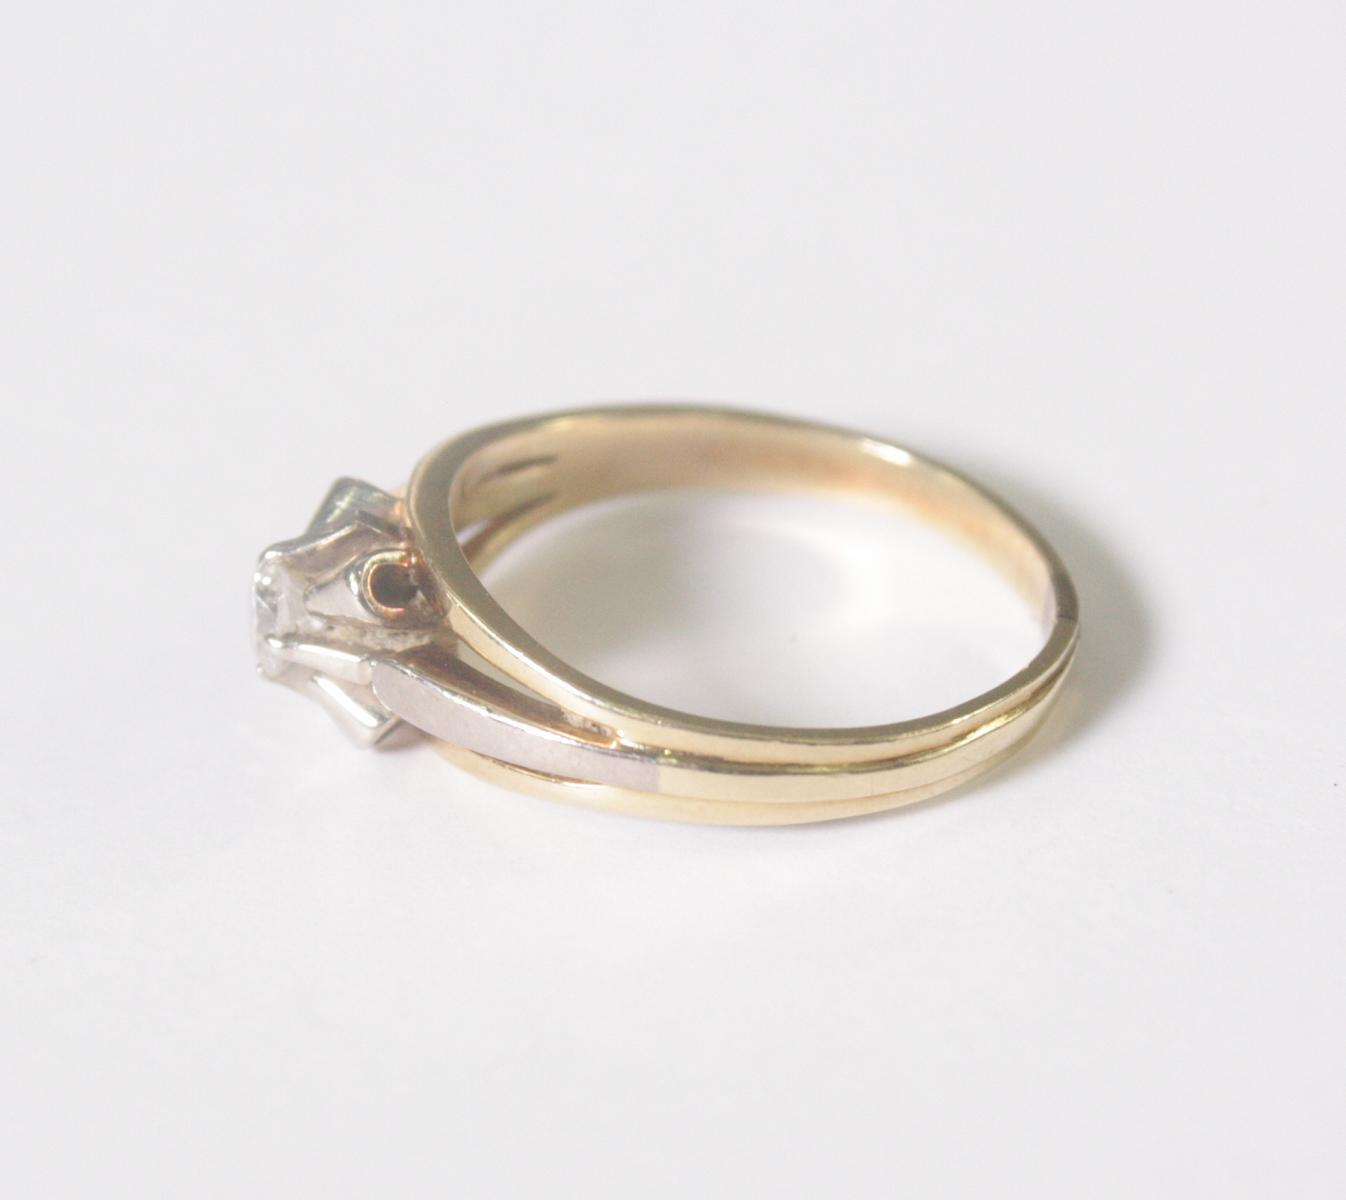 Damenring mit Diamant, 14 Karat Gelbgold-3